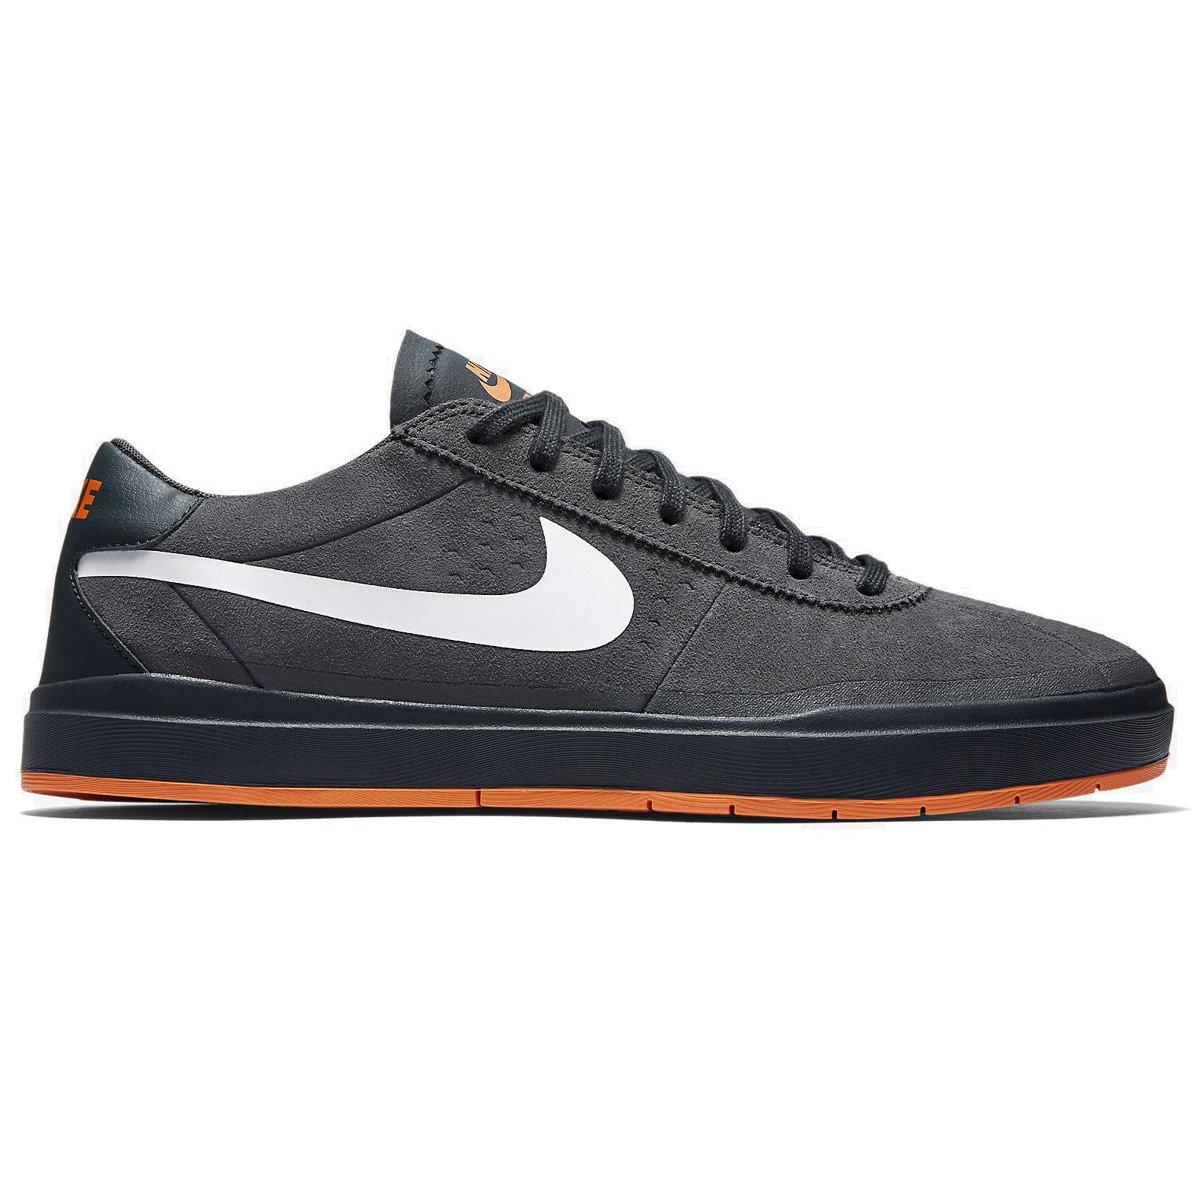 wholesale dealer d05ce 77d59 Nike Sb Bruin Sb Hyperfeel Xt Anthracite white-clay Orange   Shoes   Nike SB  SALE   Sale 50% -70%   Shoes Brands   Nike SB SALE   Sale - 40%   Shoes  Buty ...